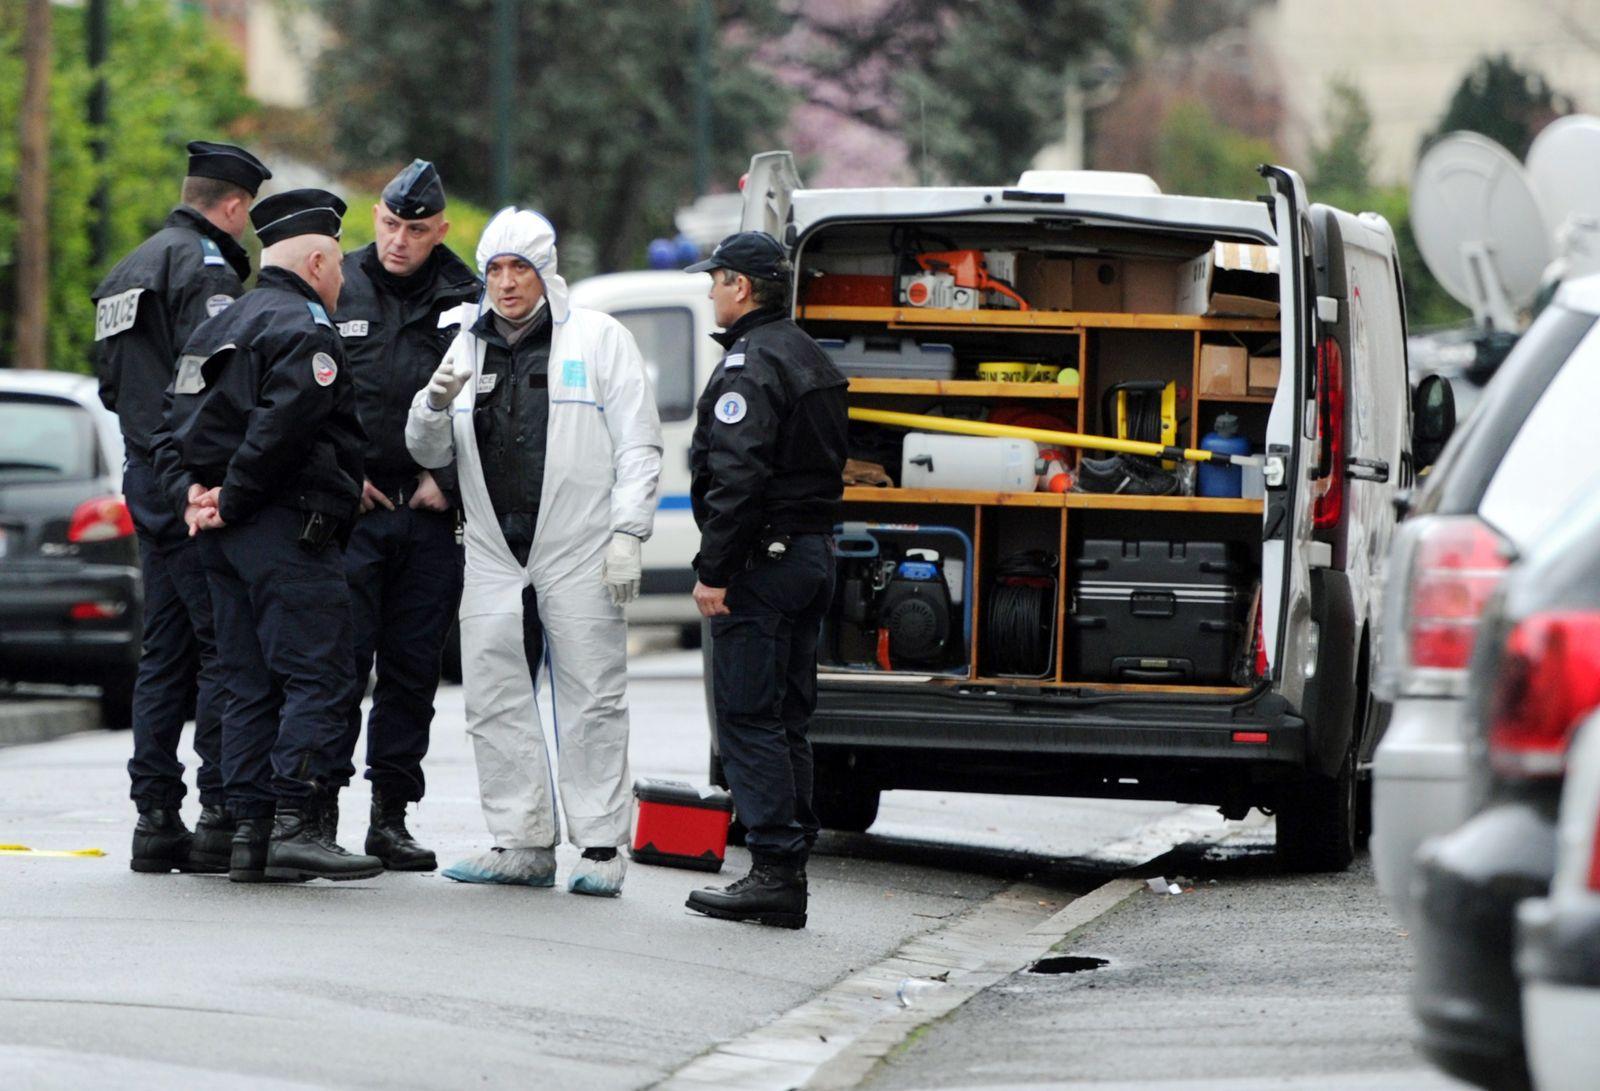 Toulouse Merah Polizisten